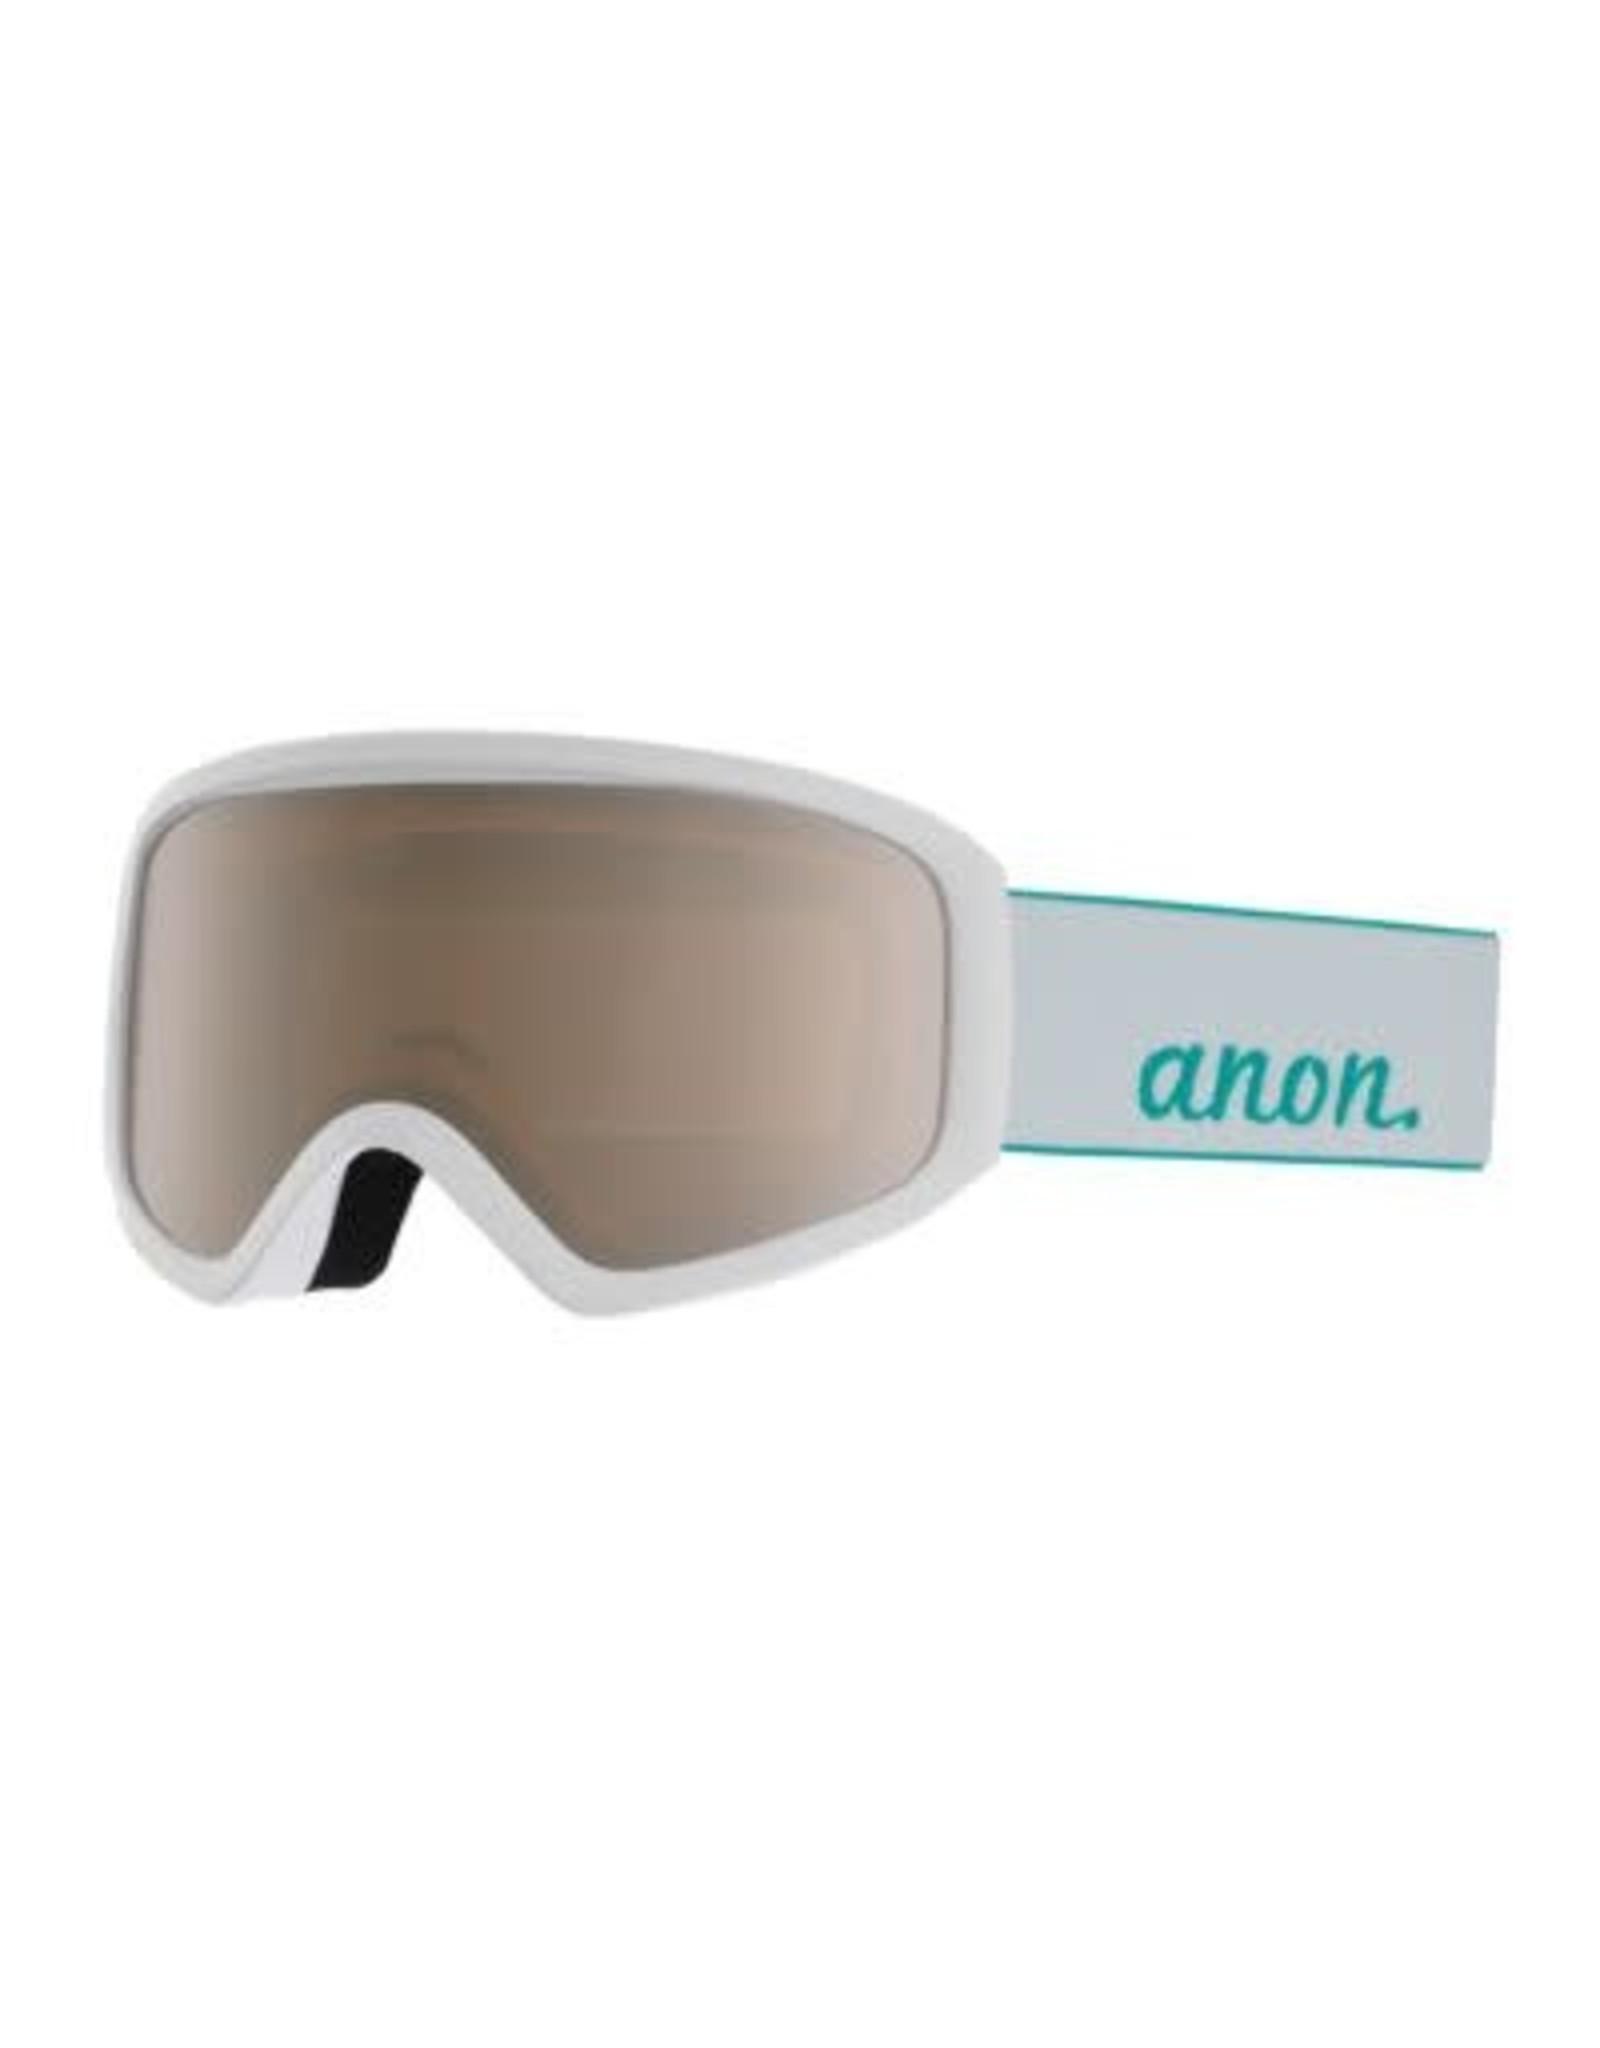 Anon Insight Goggle + Spare Lens